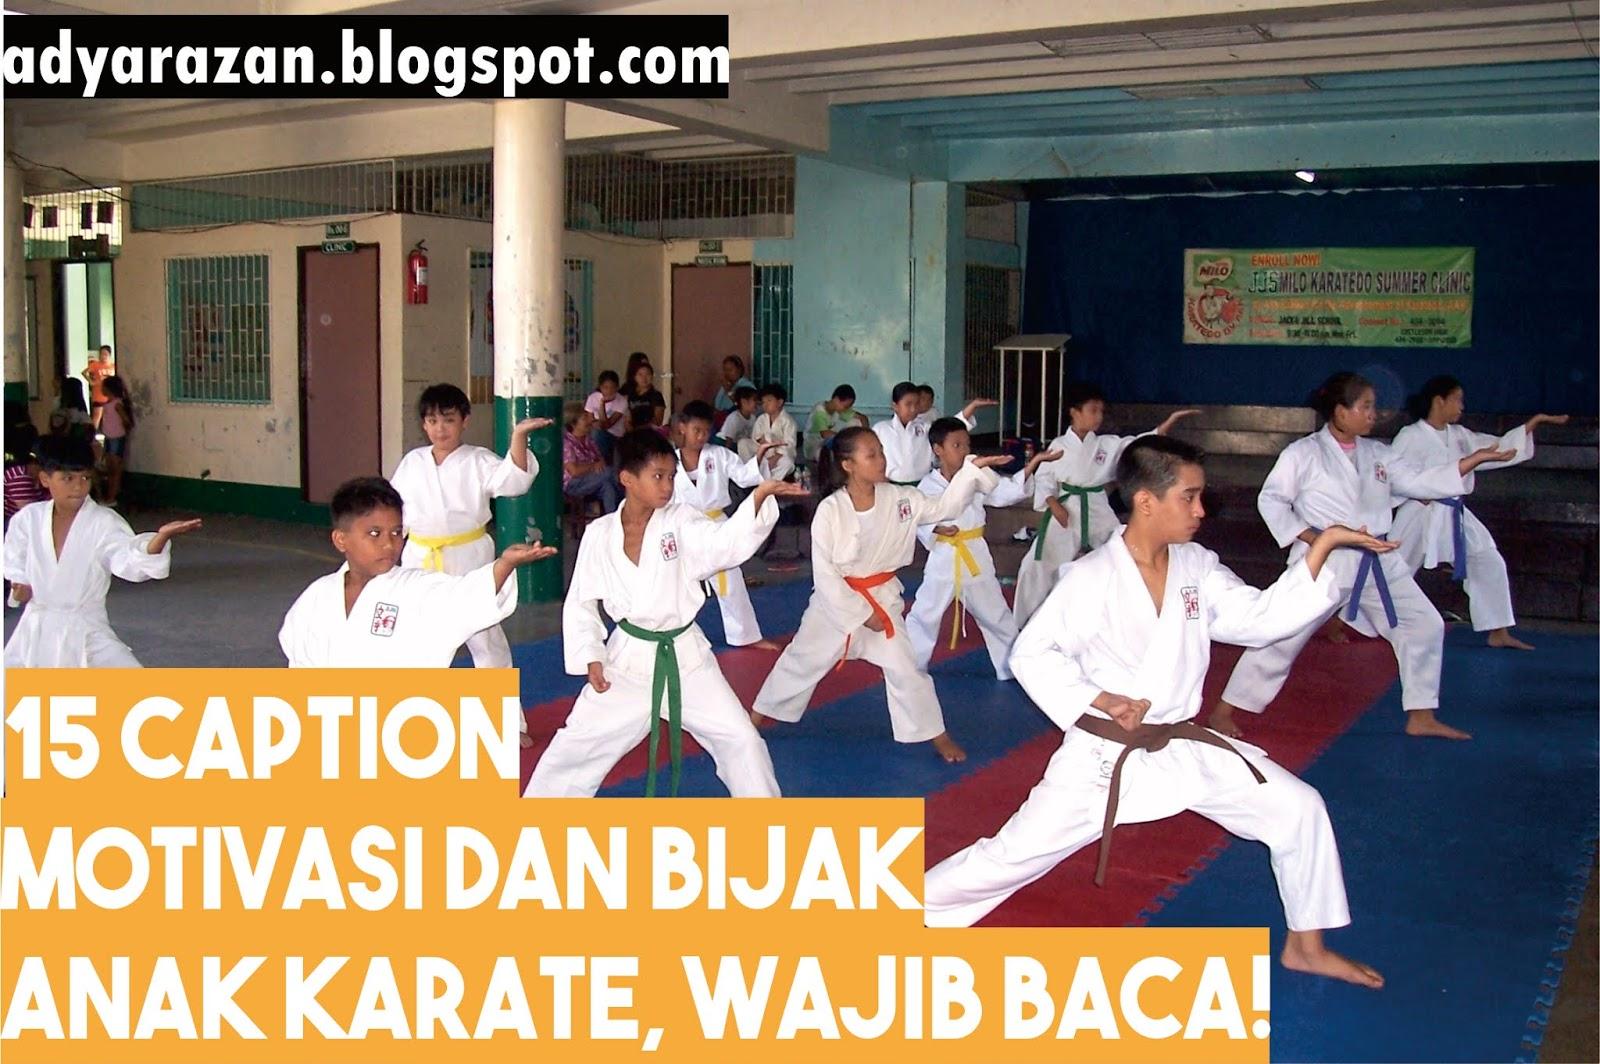 15 Caption Motivasi Dan Bijak Anak Karate Wajib Baca Adya Razan